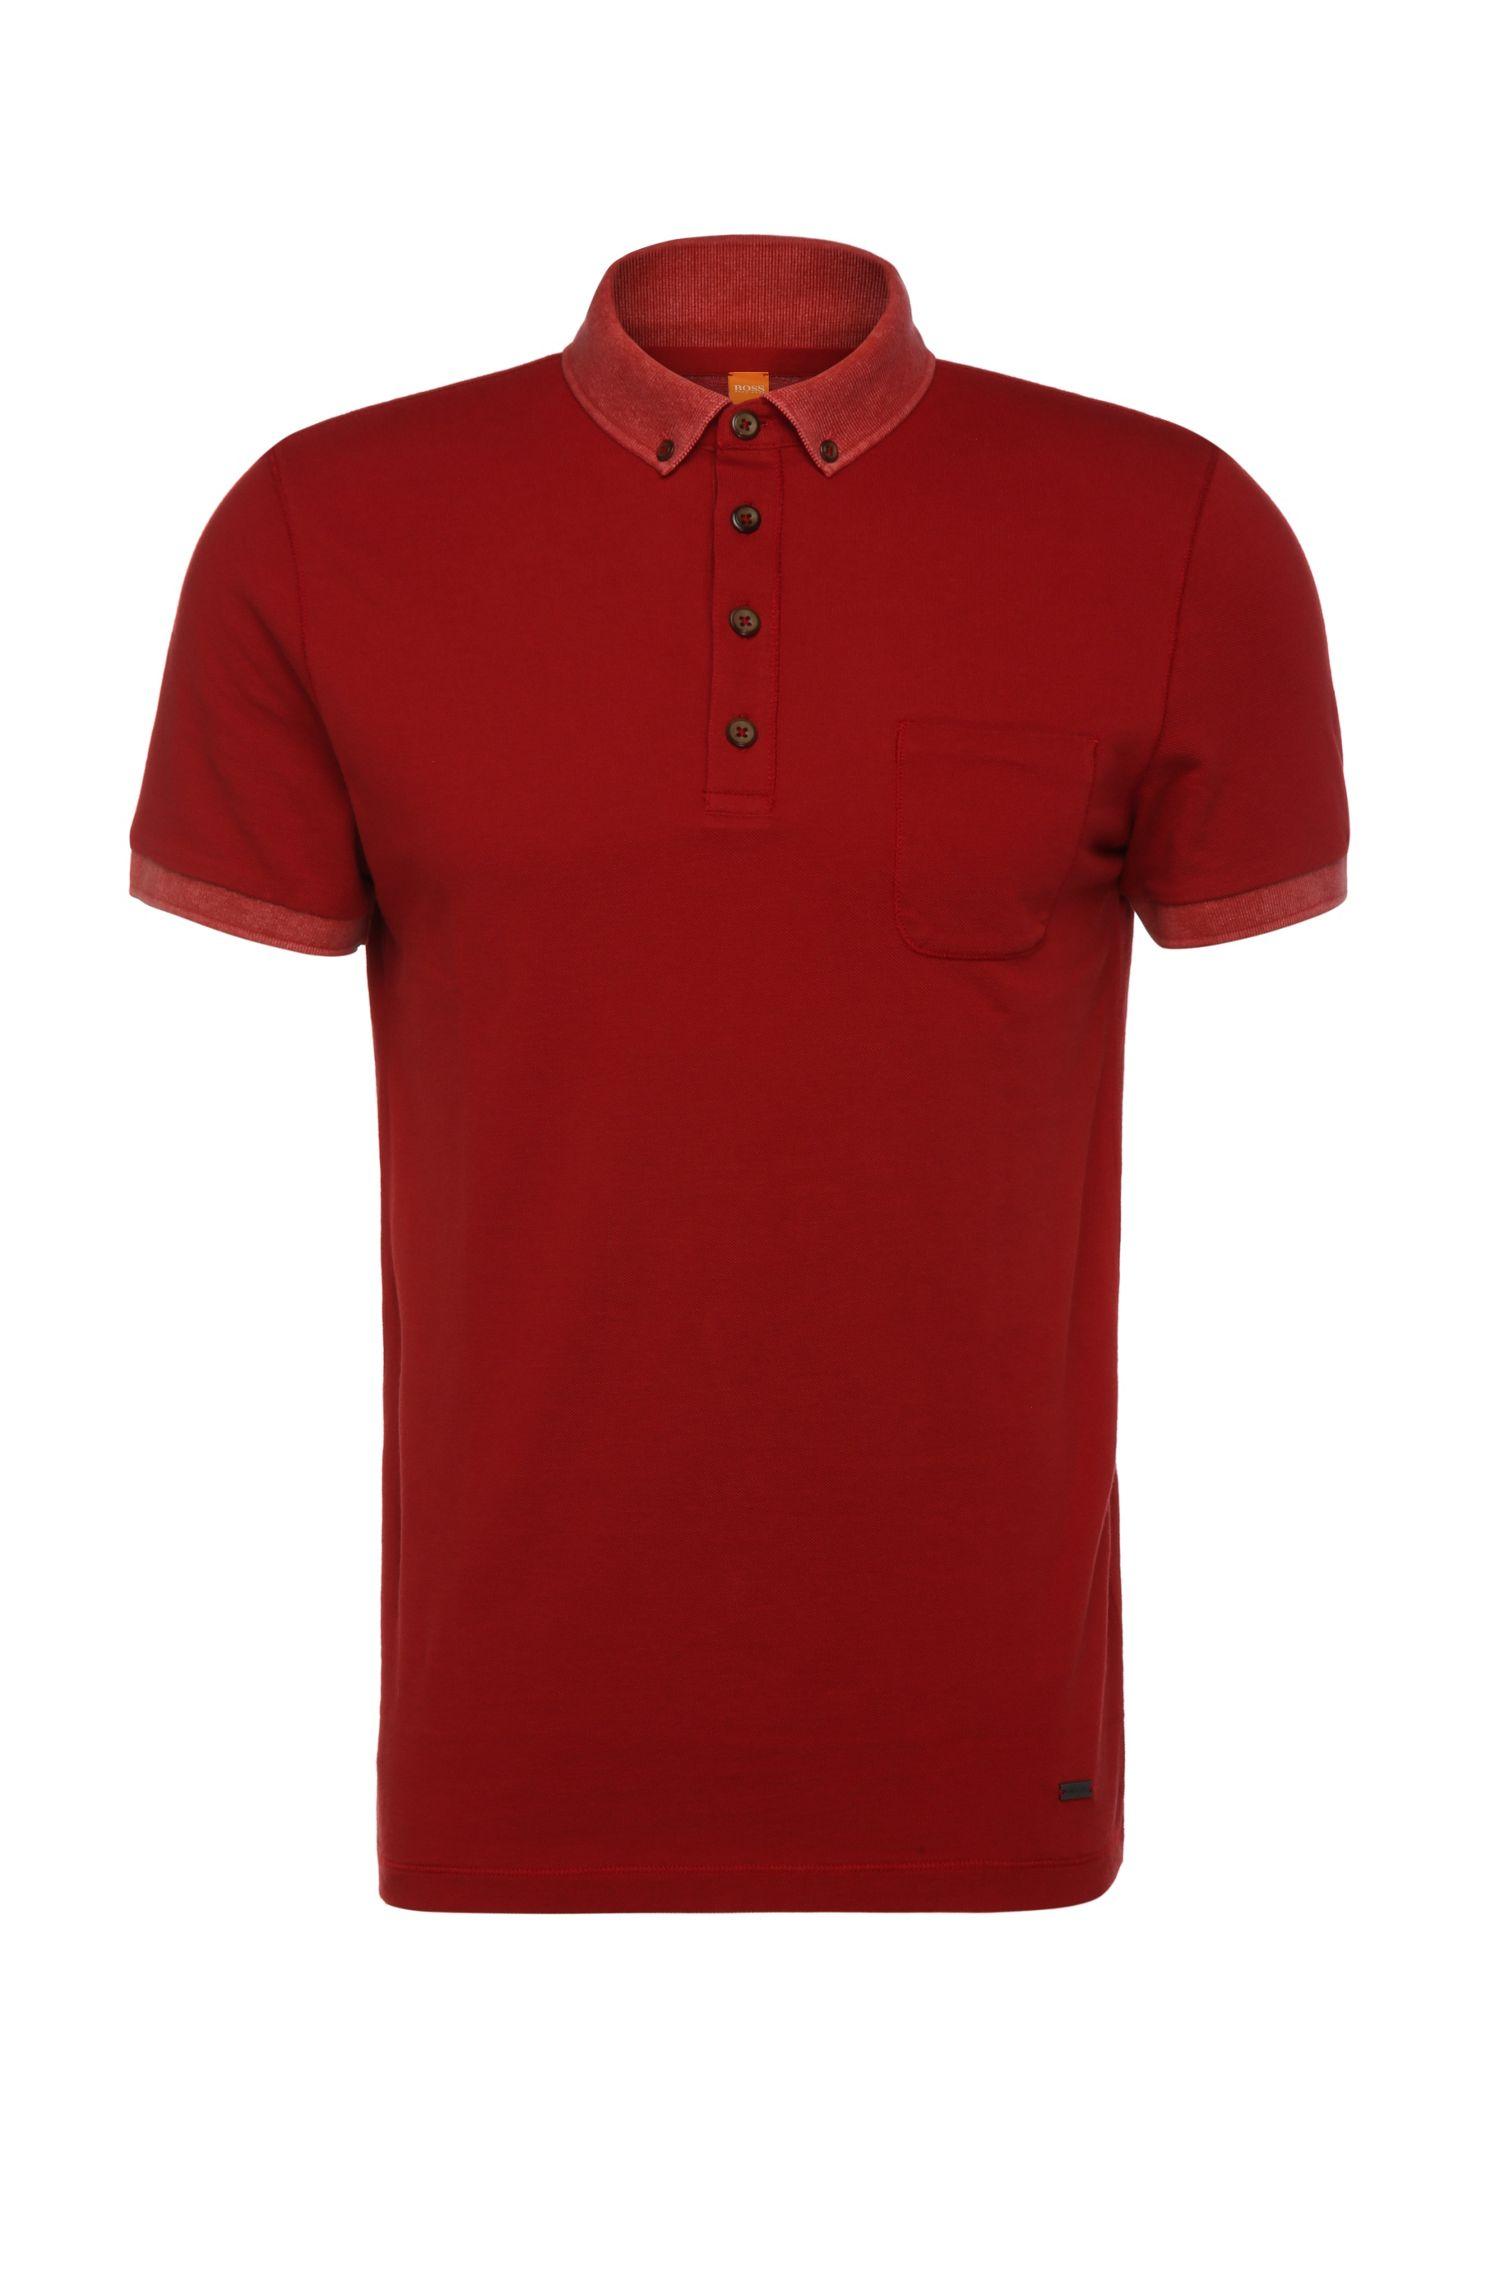 'Prynce' | Slim Fit, Cotton Piqué Polo Shirt